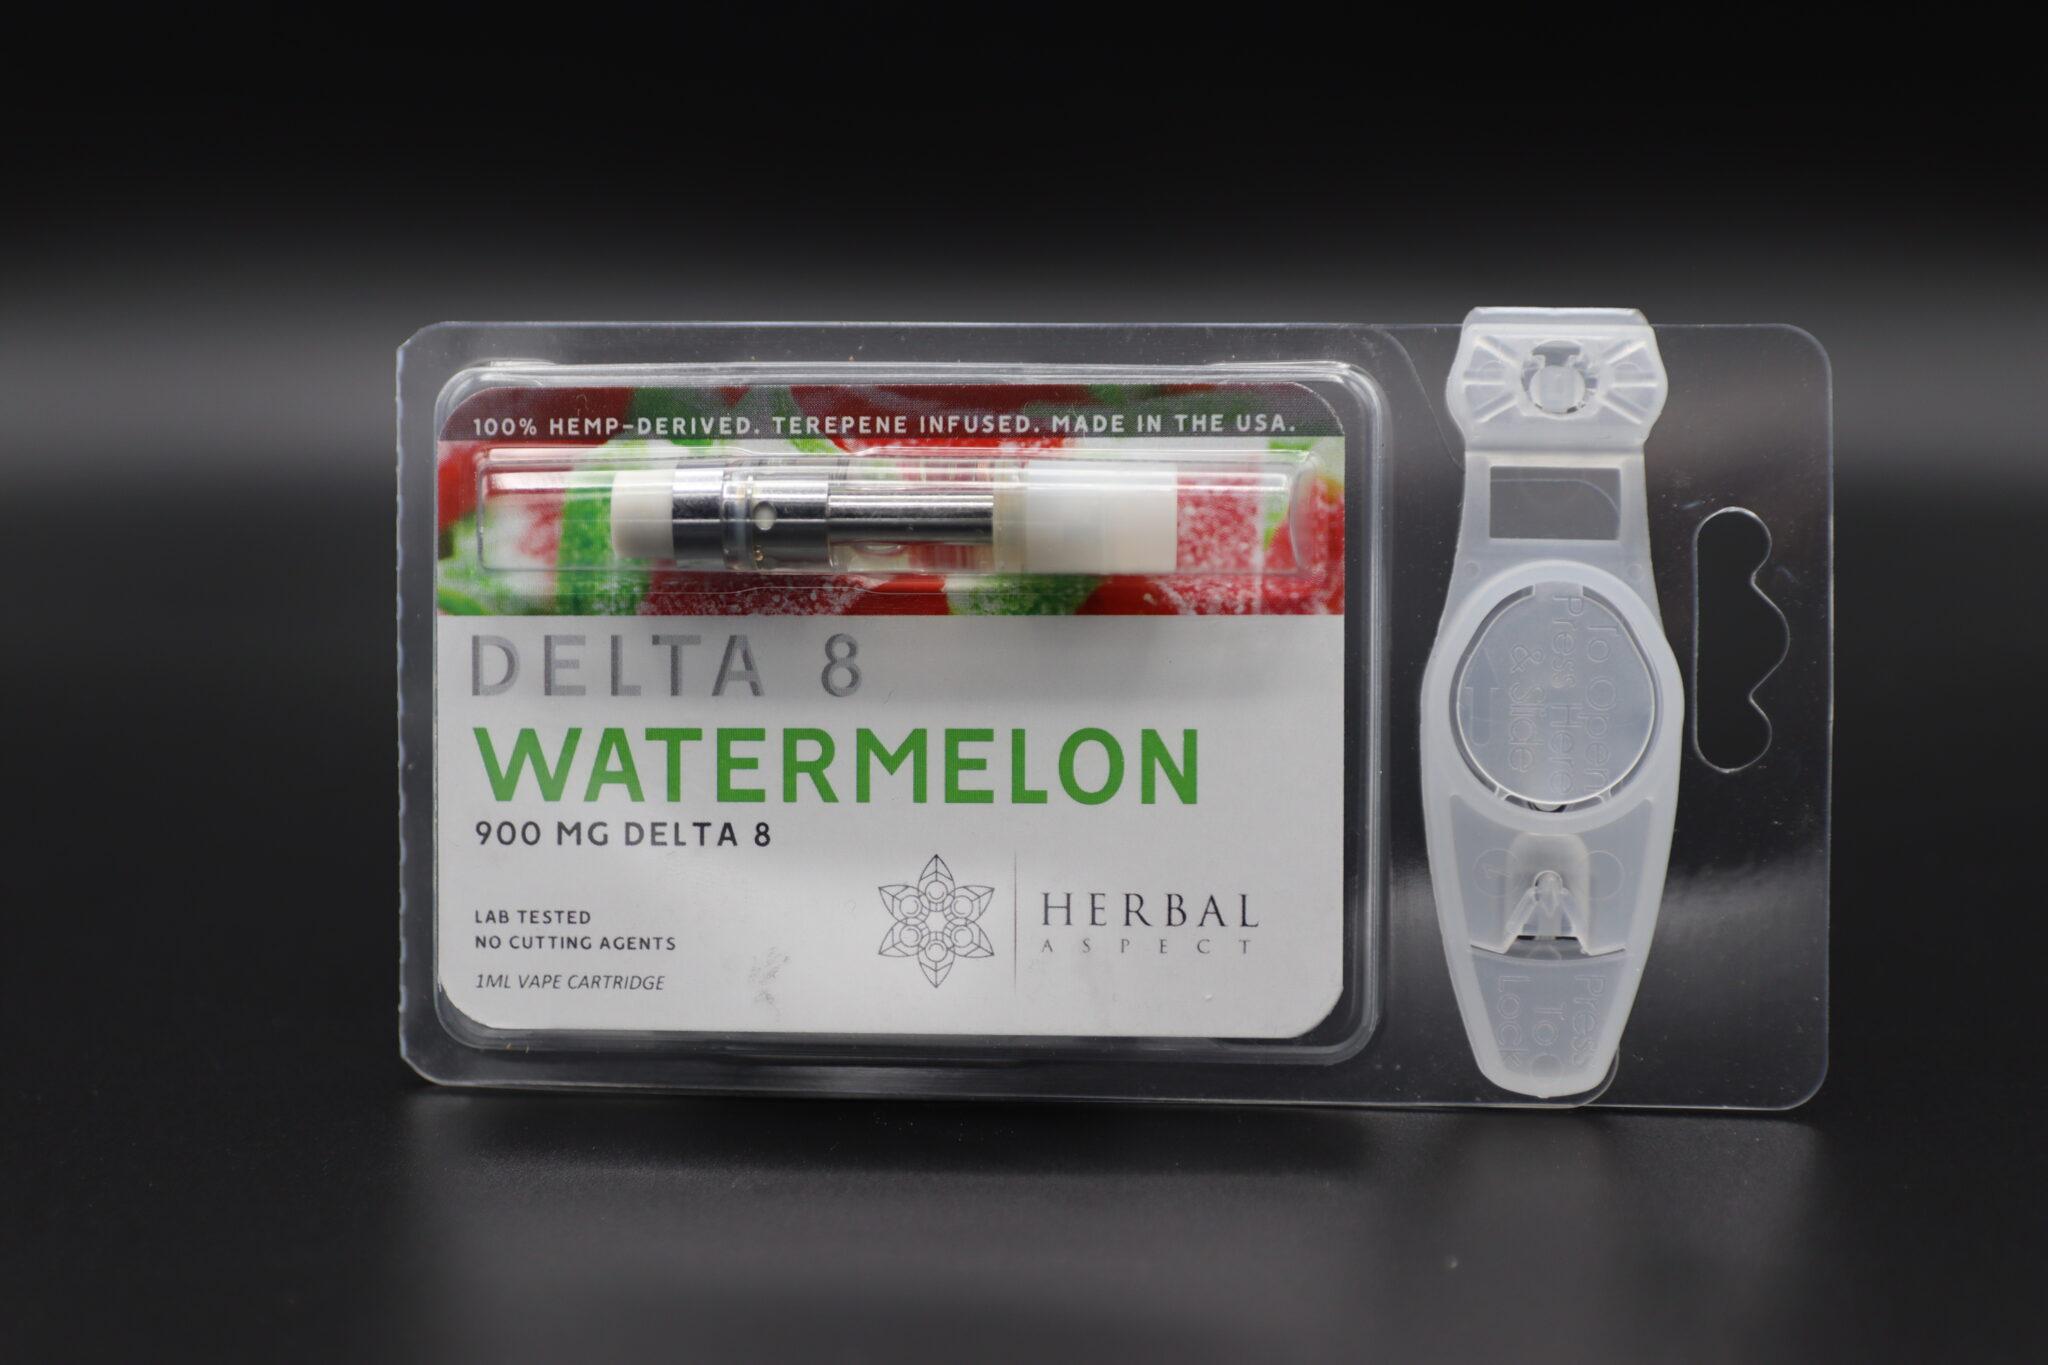 Herbal Aspect Delta 8 Vape - 900 MG -Watermelon